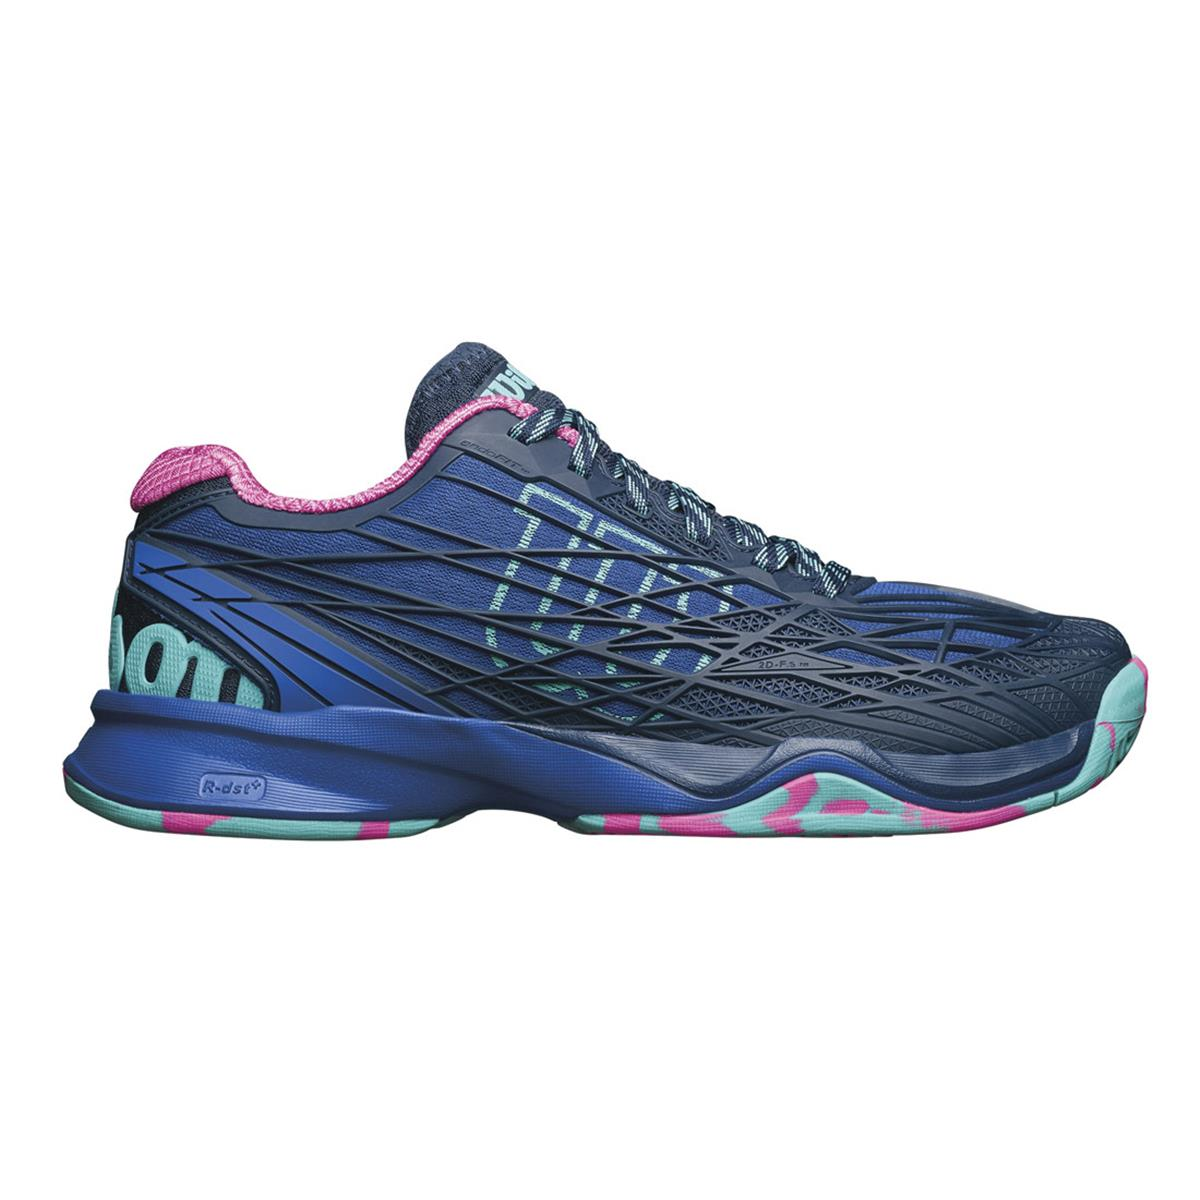 wilson kaos womens tennis shoes blue by directtennis